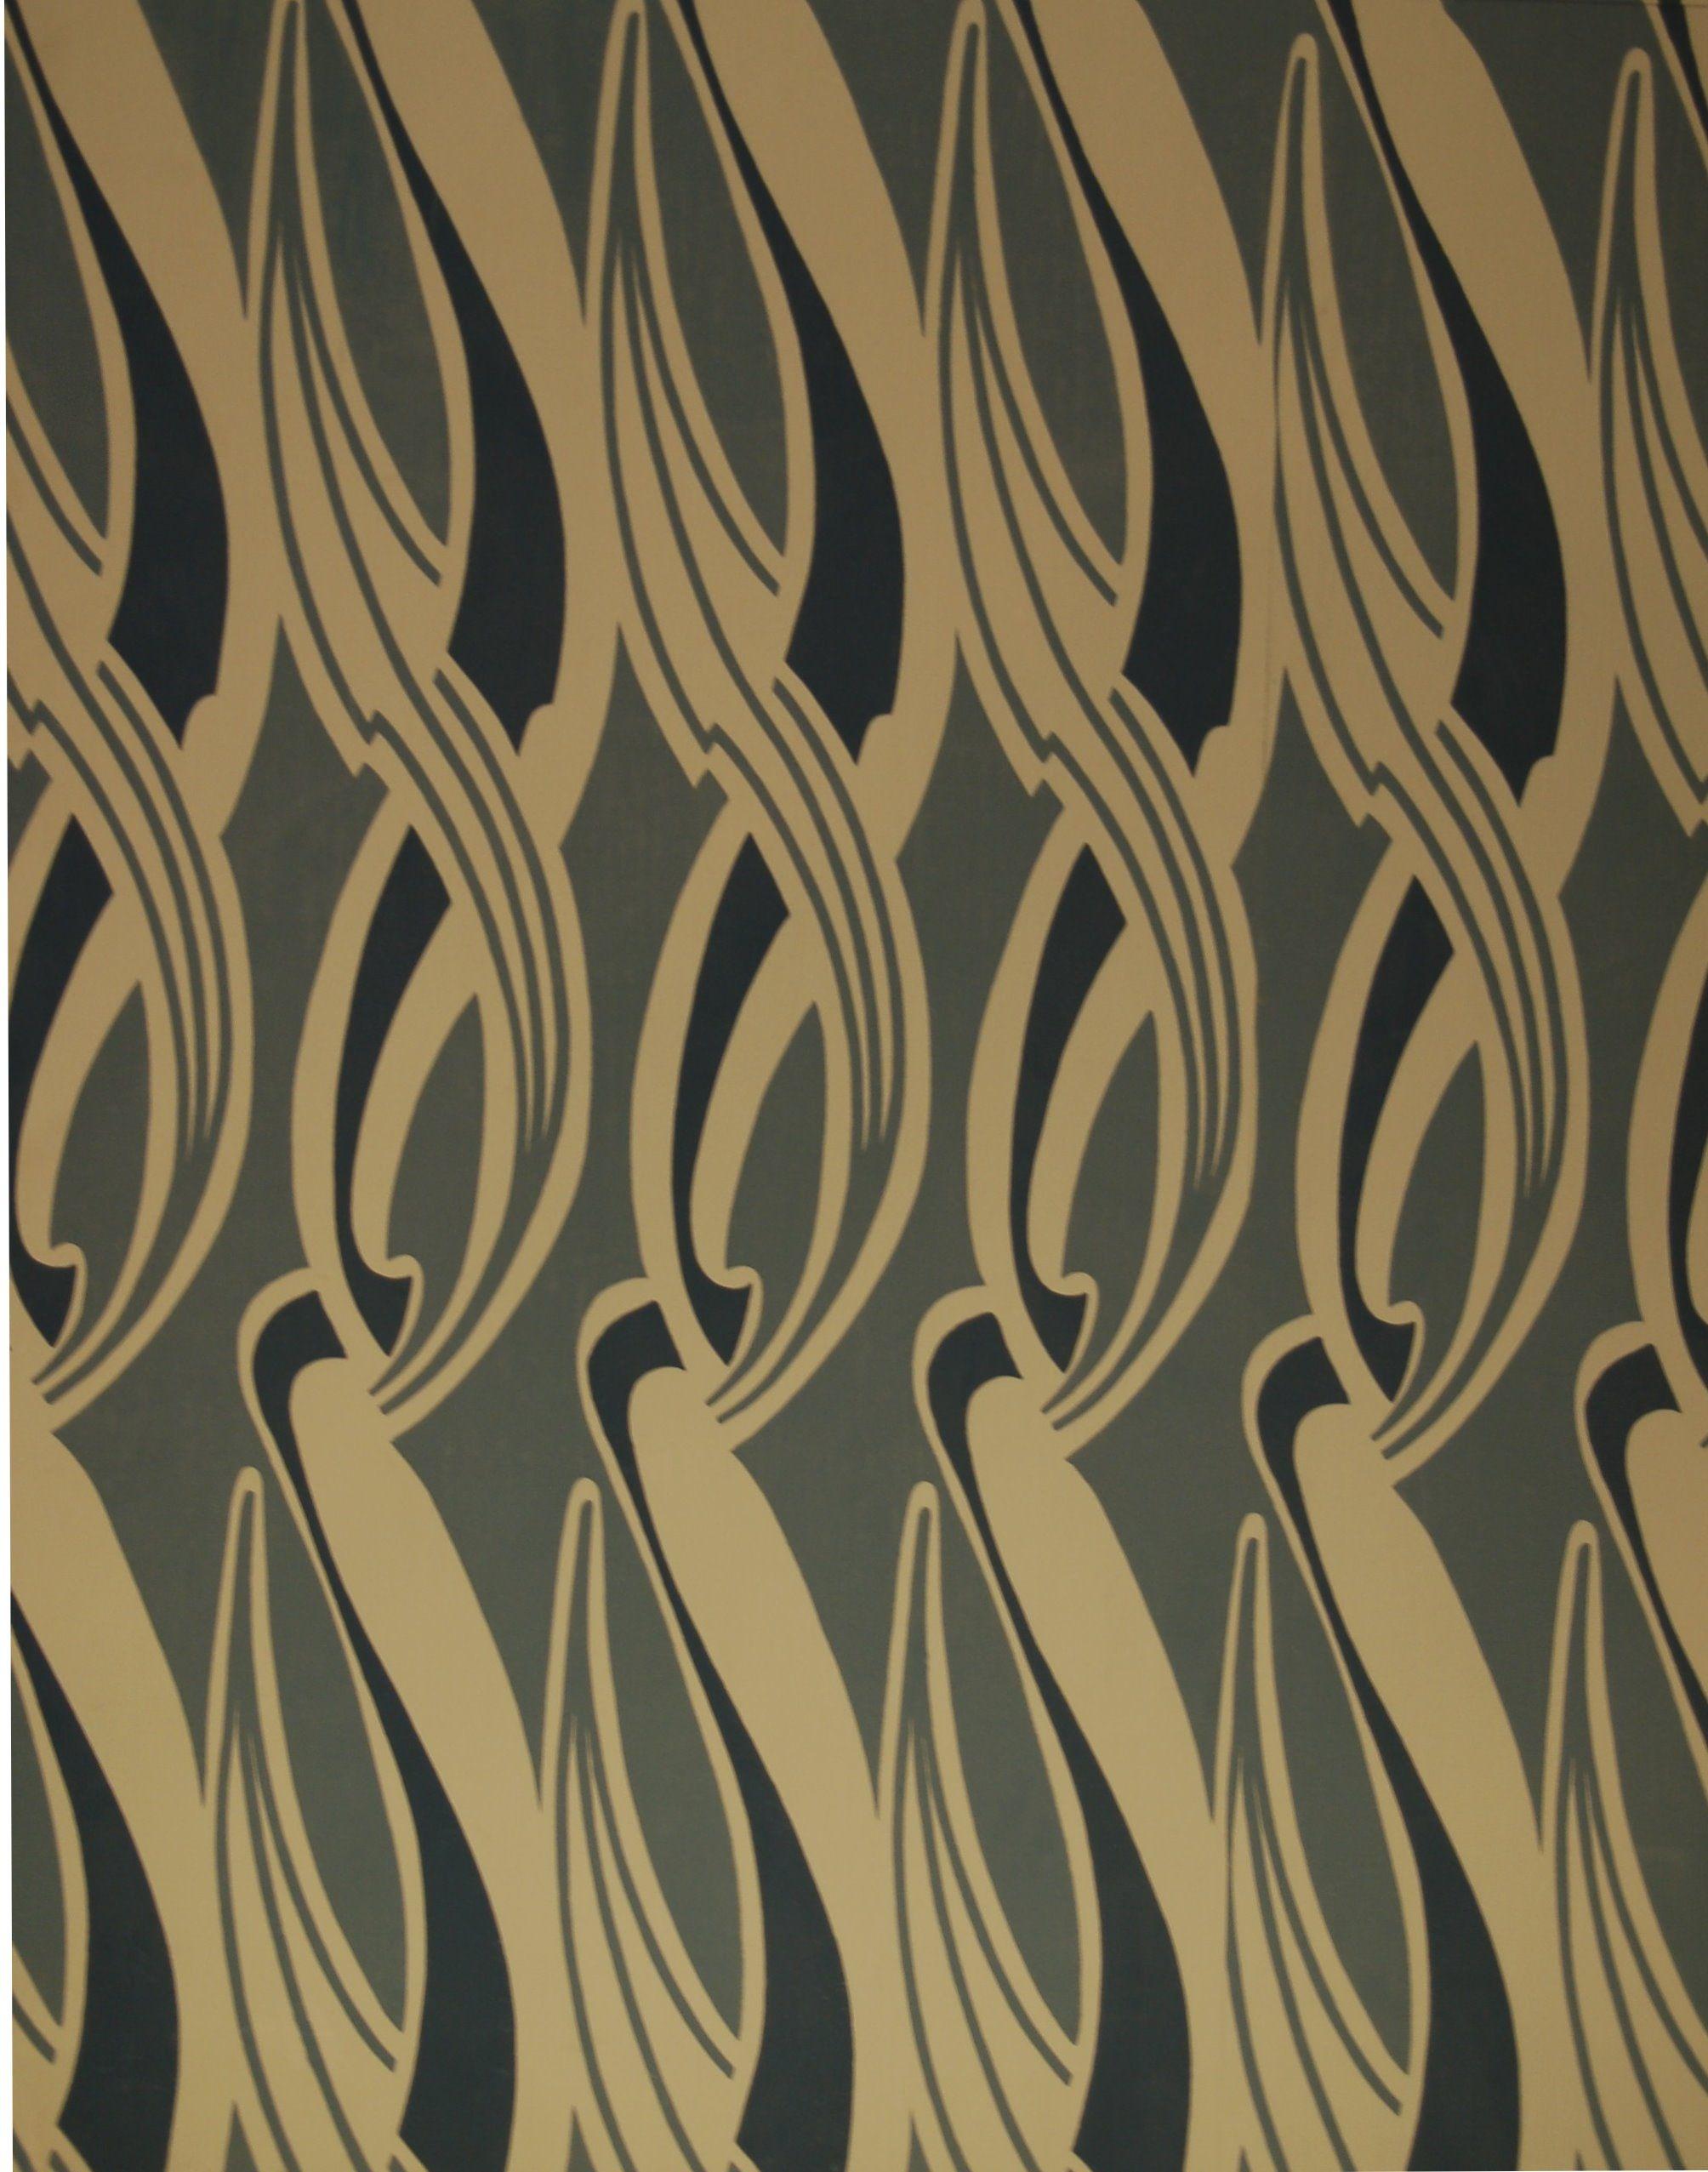 tapete 513 a henry van de velde blau historische tapeten hembus gmbh art nouveu. Black Bedroom Furniture Sets. Home Design Ideas